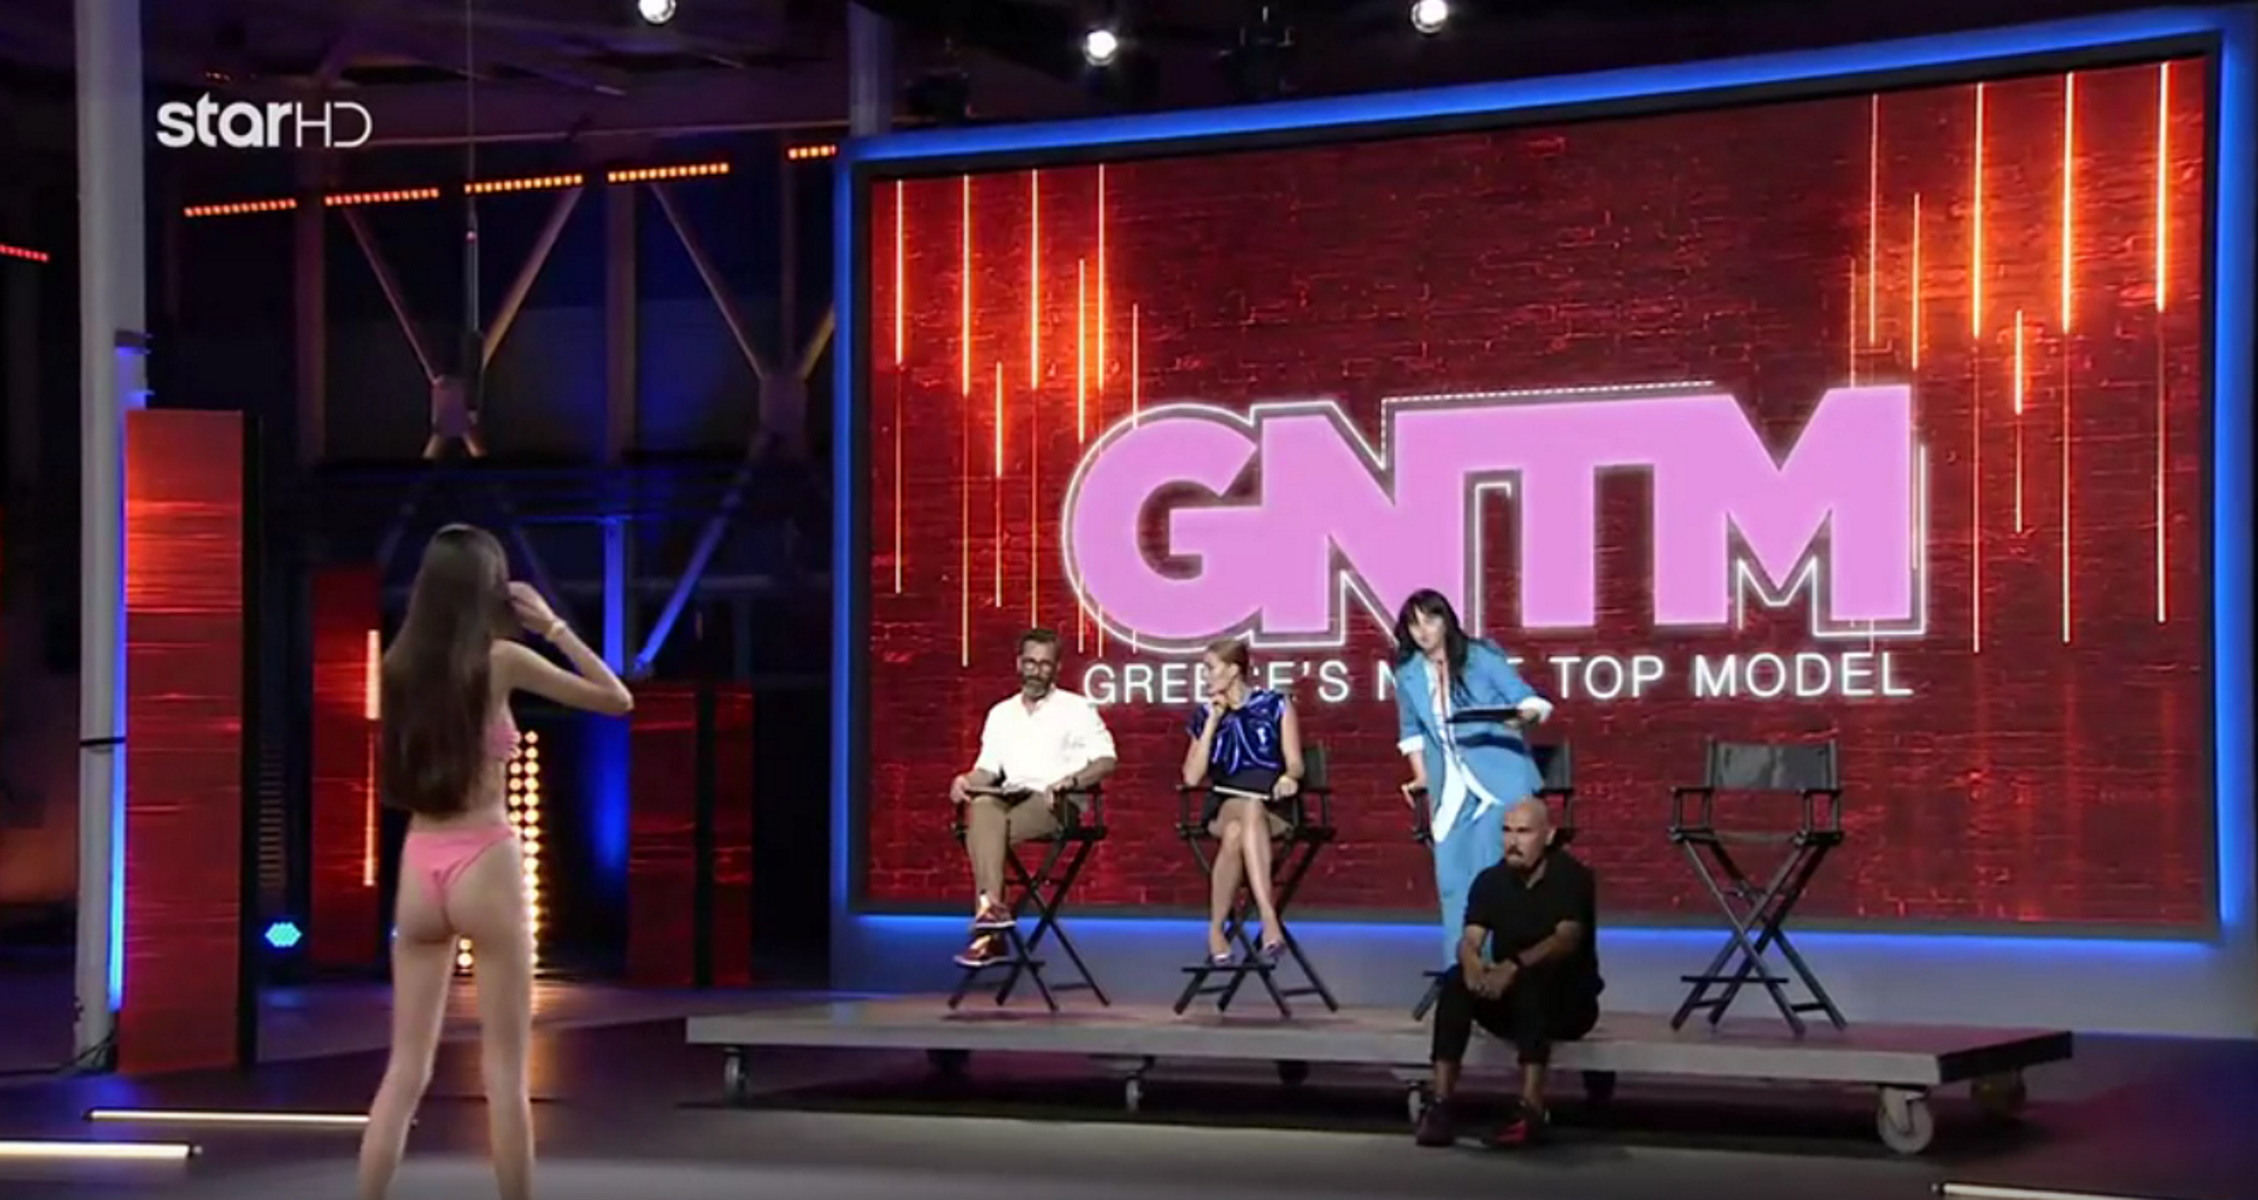 GNTM: Η Ειρήνη Λεμπέση τρέλανε τους κριτές αλλά το Instagram «πρόδωσε» το ψέμα της